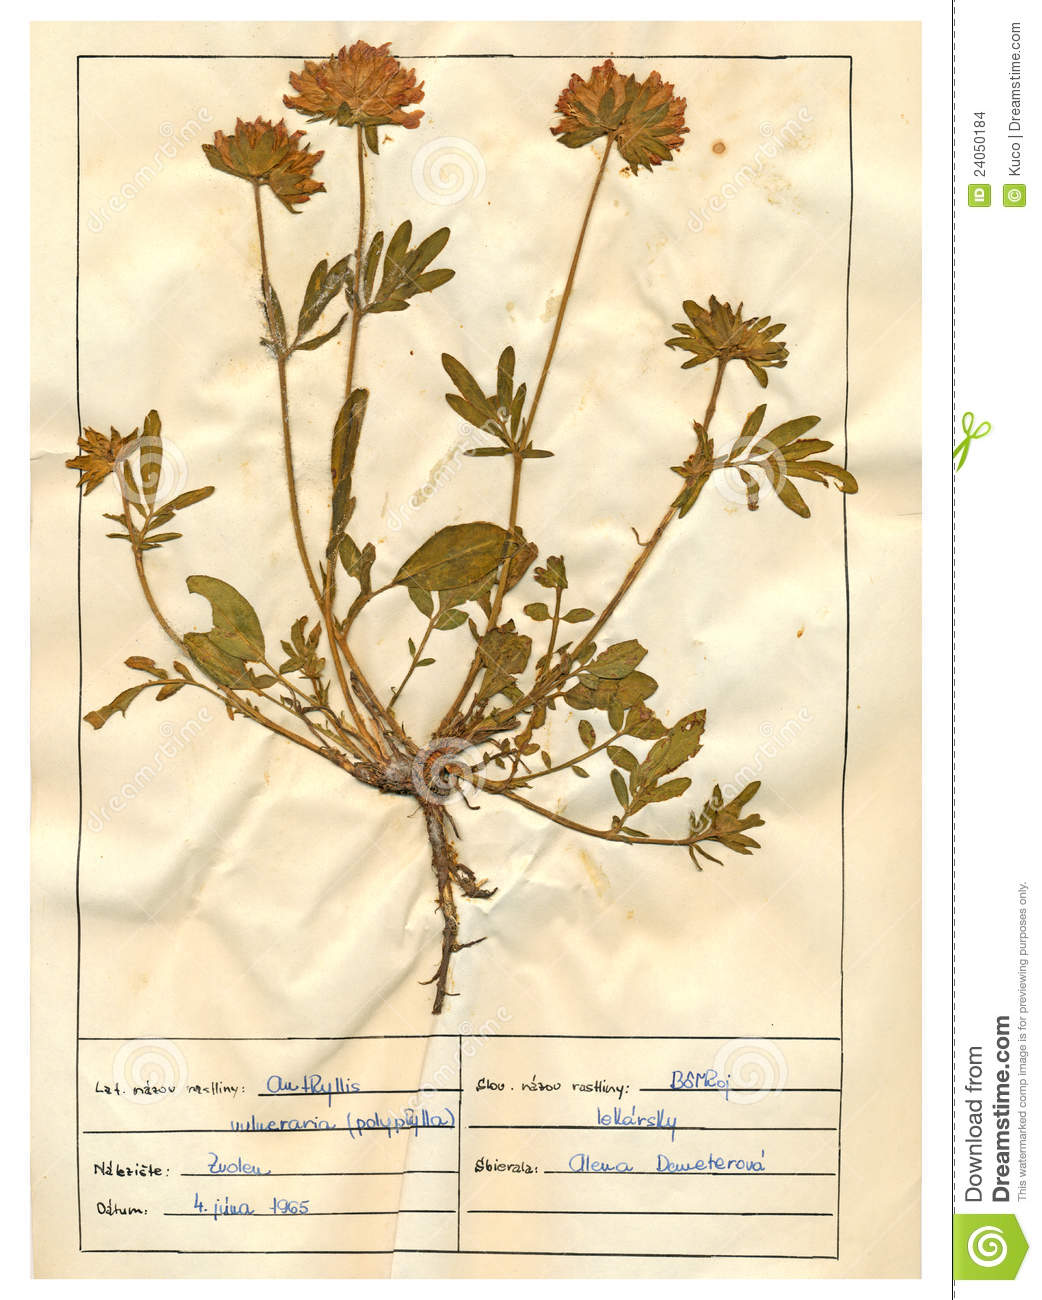 Herbarium Sheet.